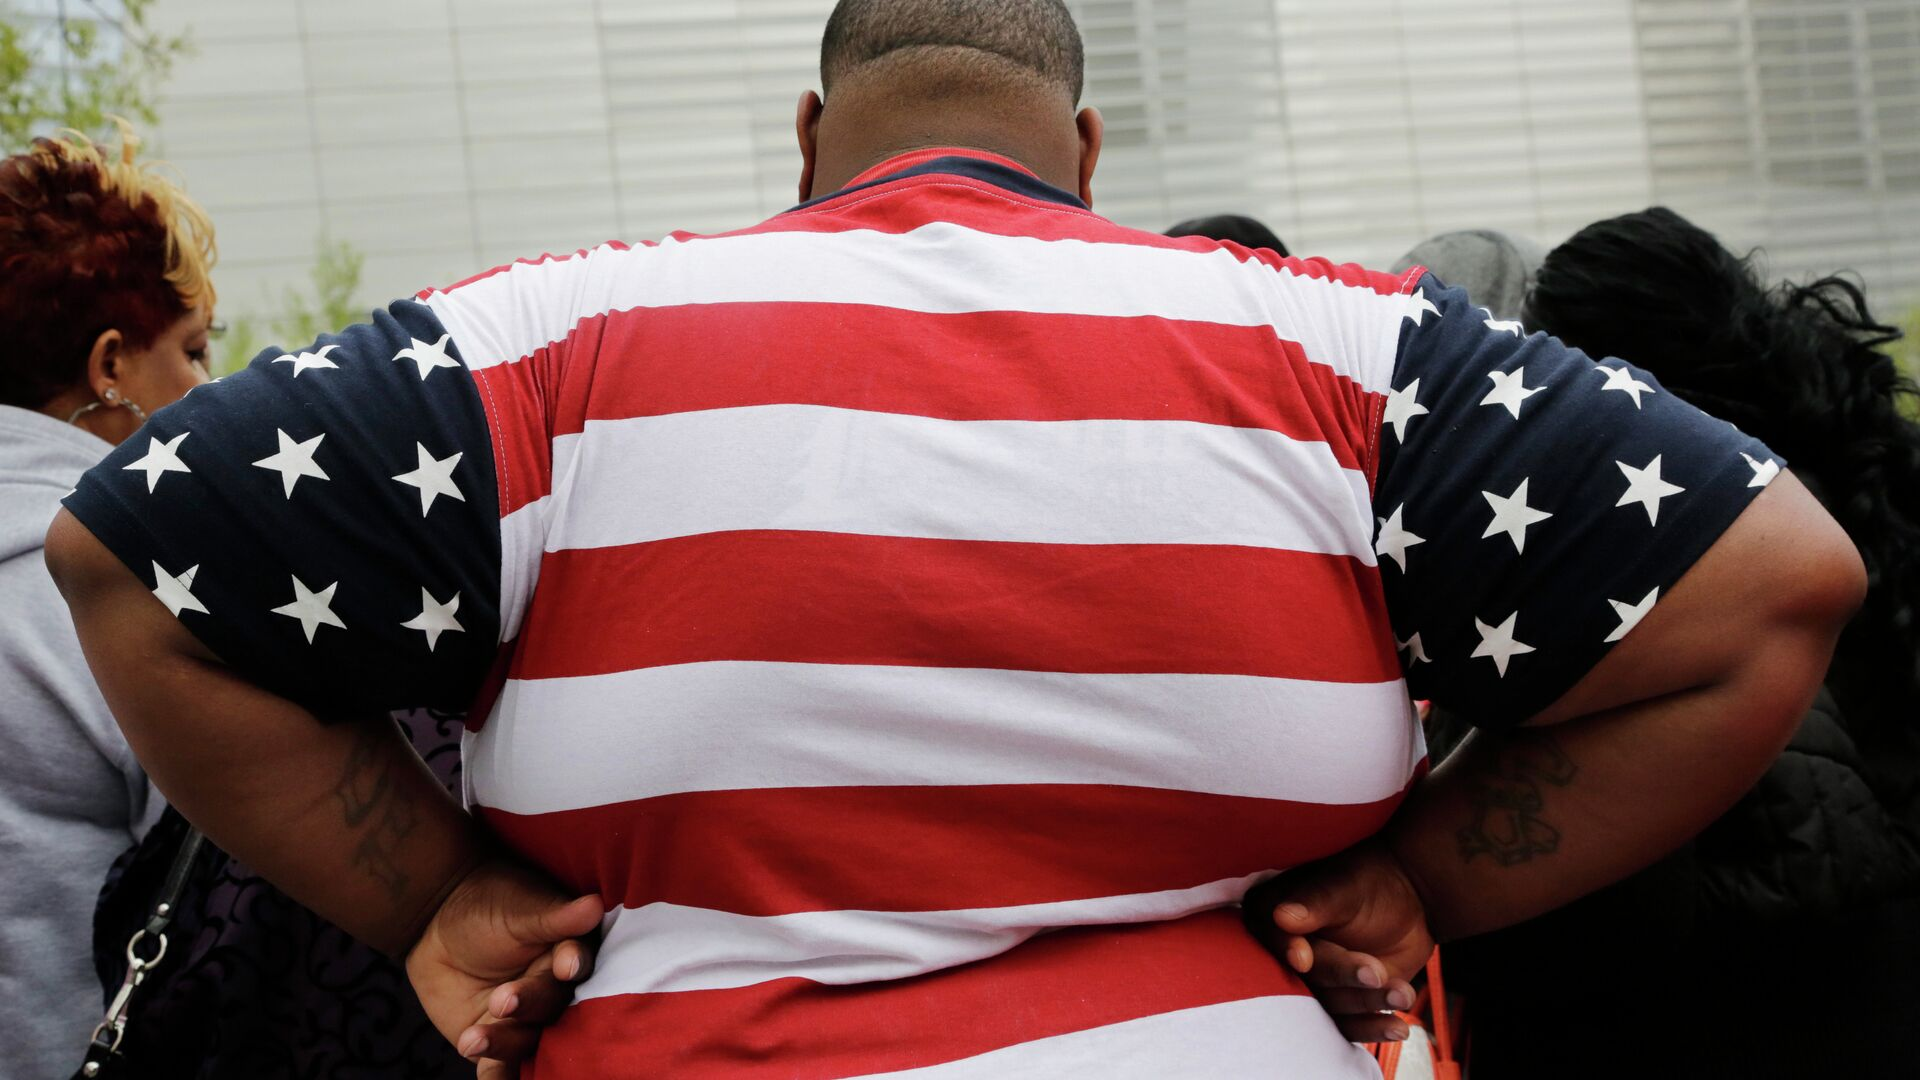 Overweight man wears a shirt patterned after the American flag - Sputnik International, 1920, 15.09.2021